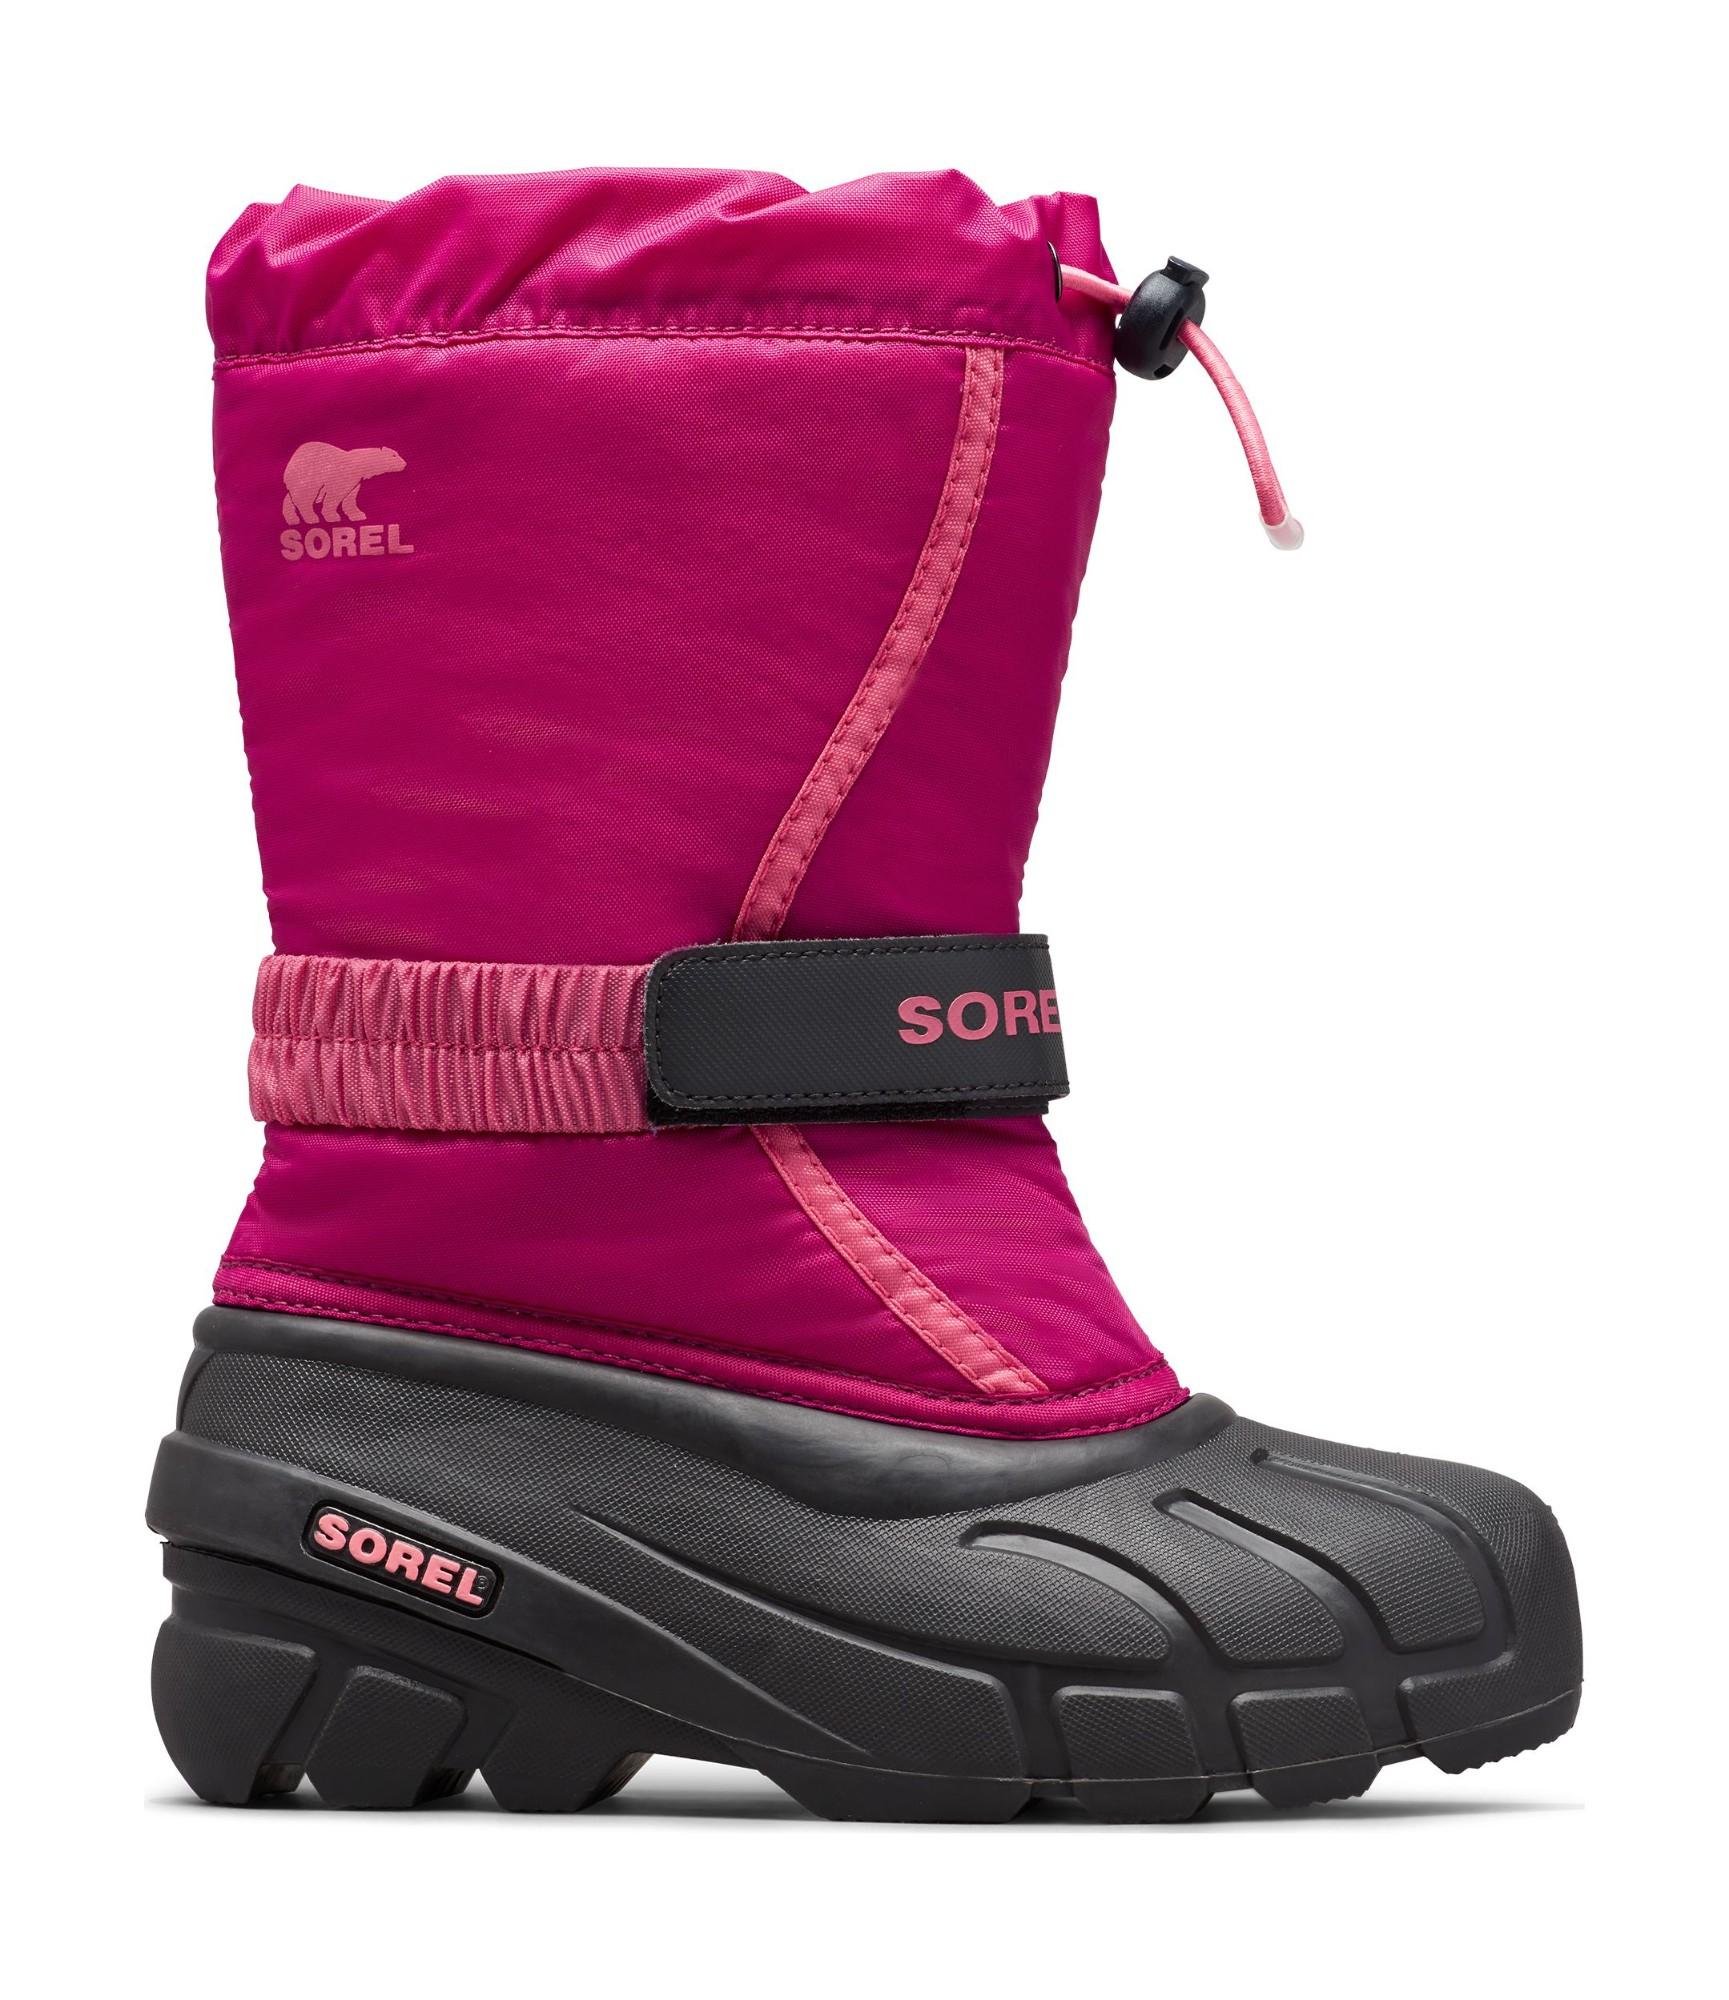 Sorel Flurry Youth Deep Blush/Tropic Pink 36